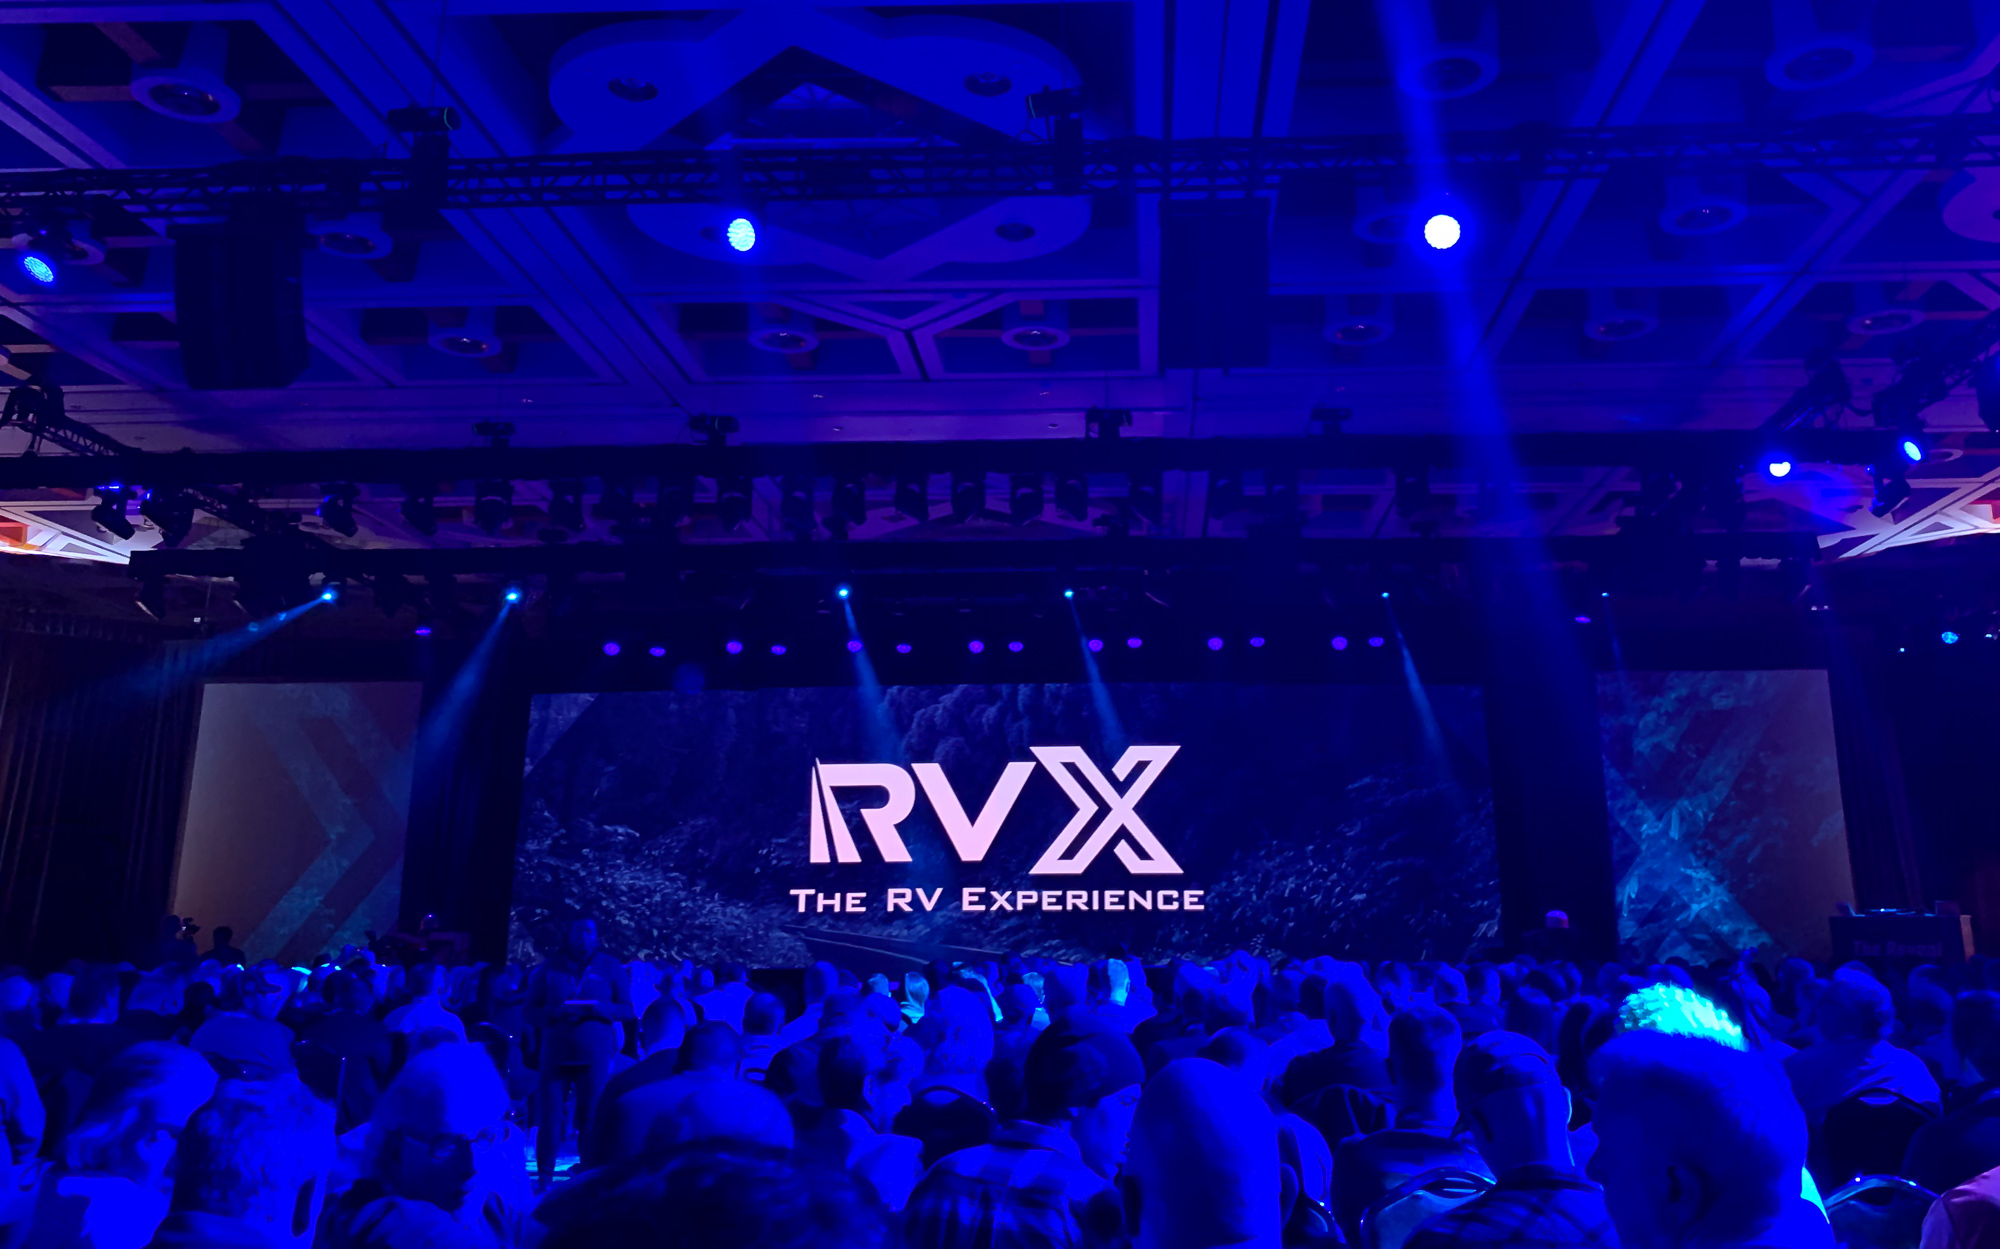 RVX event review - ochristine